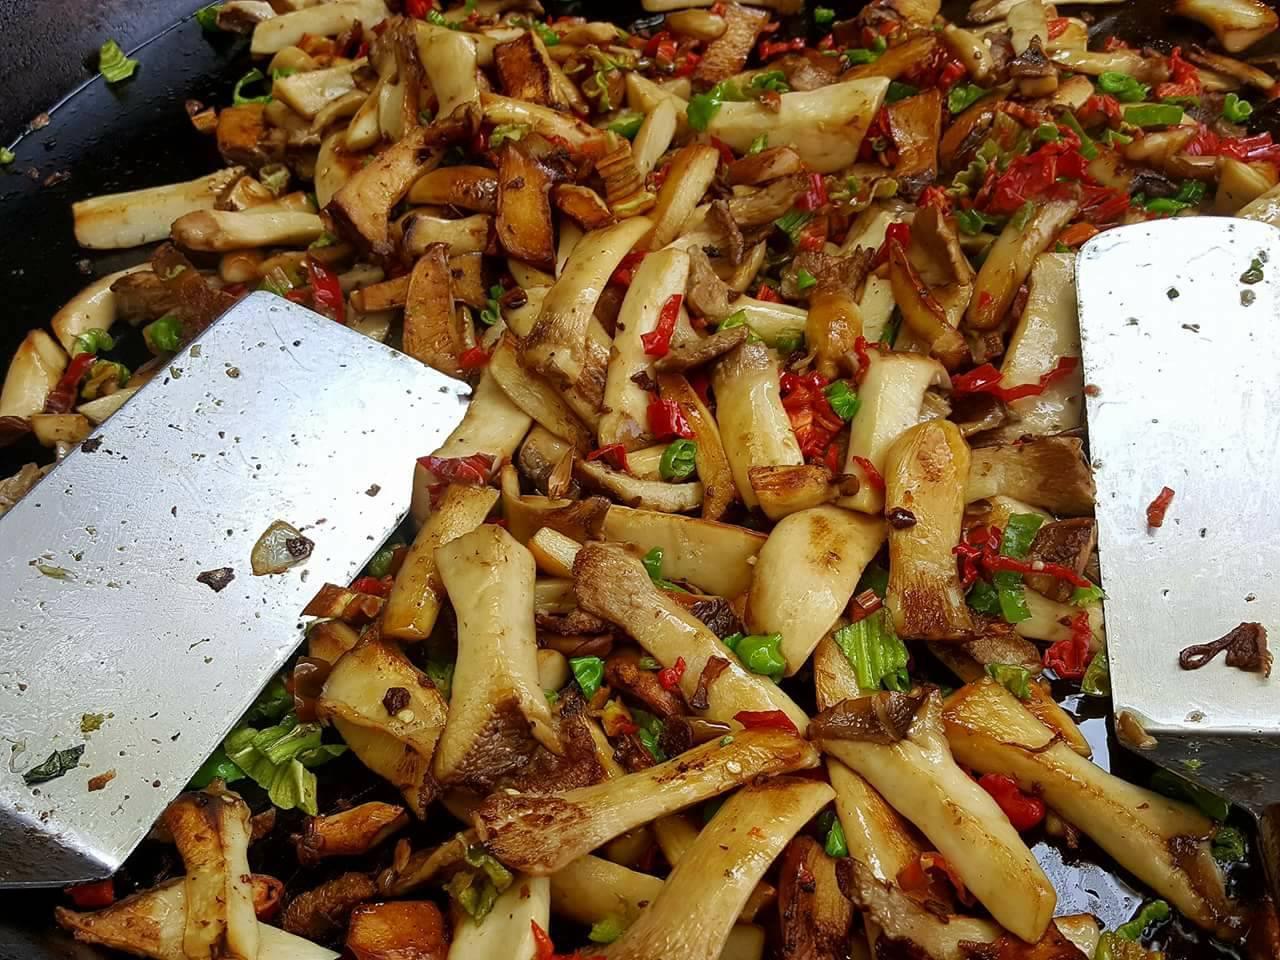 Chef Jodie Rubin sauted 150 lbs of trumpet mushrooms at Backyard